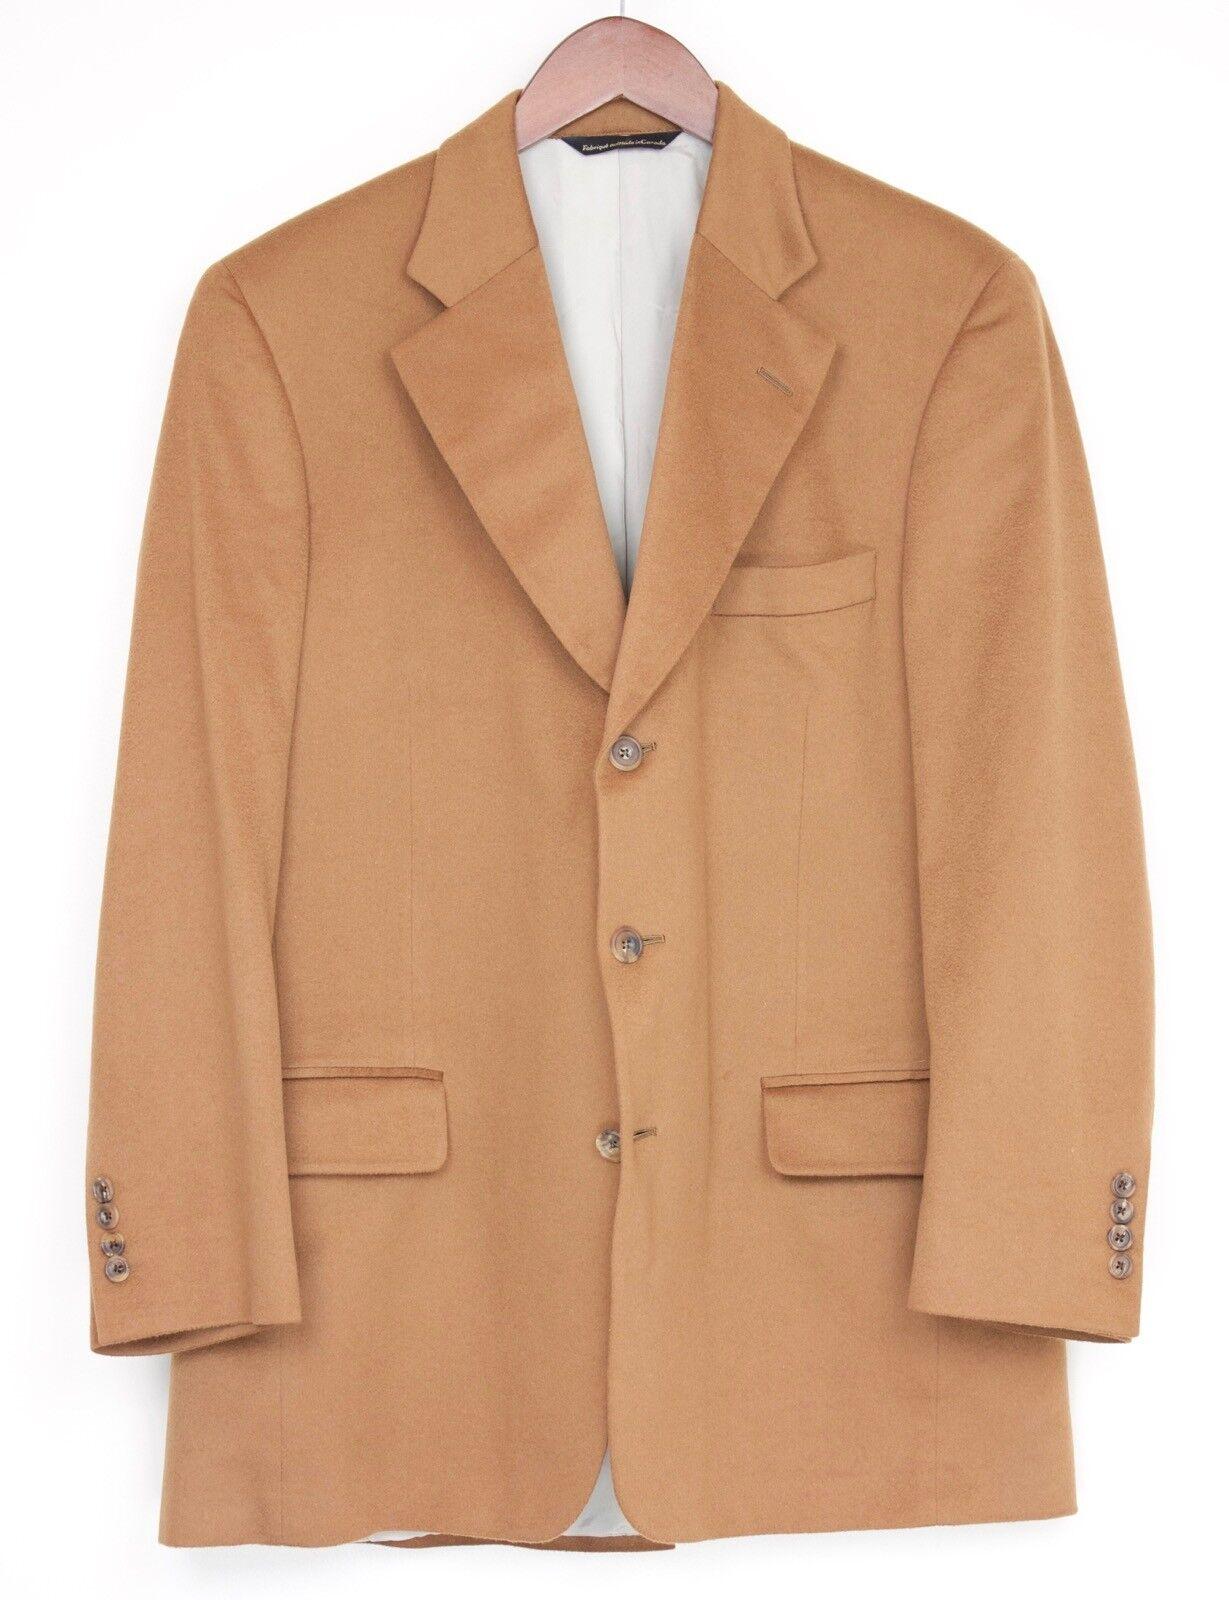 Samuelsohn Tailors Choice Cashmere Sport Coat 42R Vicuna Brown Ultra Soft